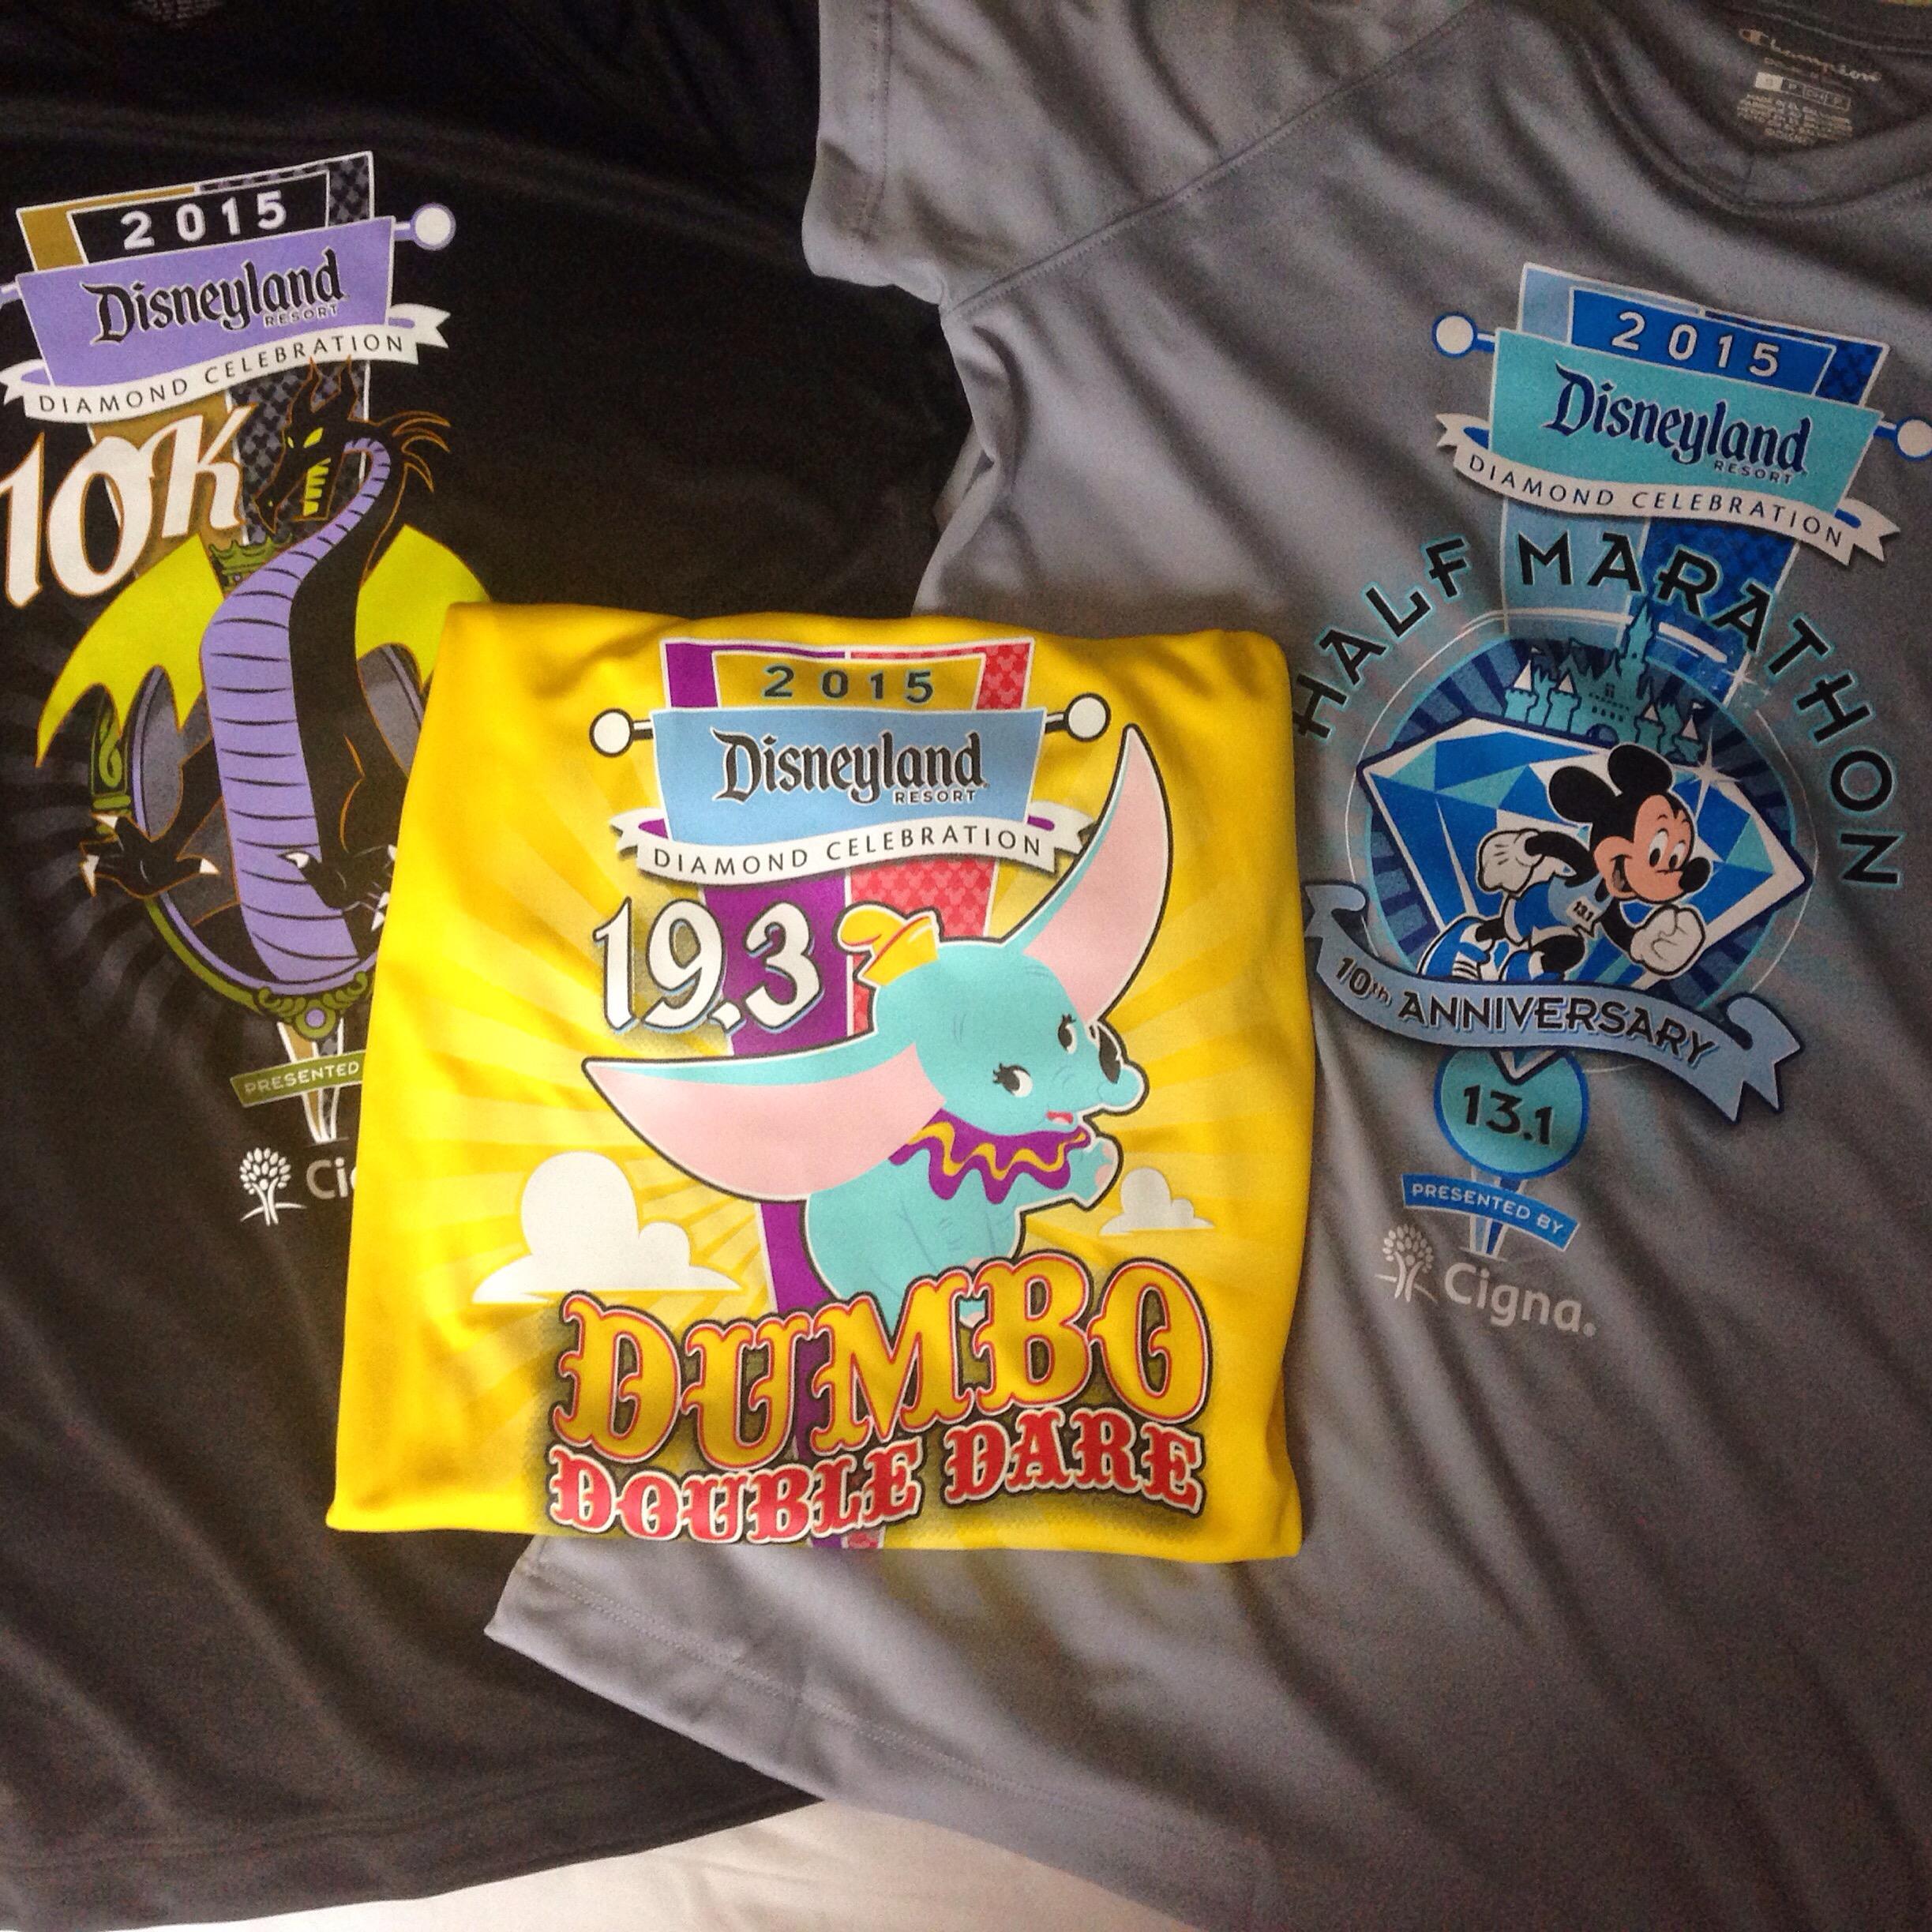 2015 Disneyland 10K, Dumbo Double Dare and Disneyland Half Marathon race shirts